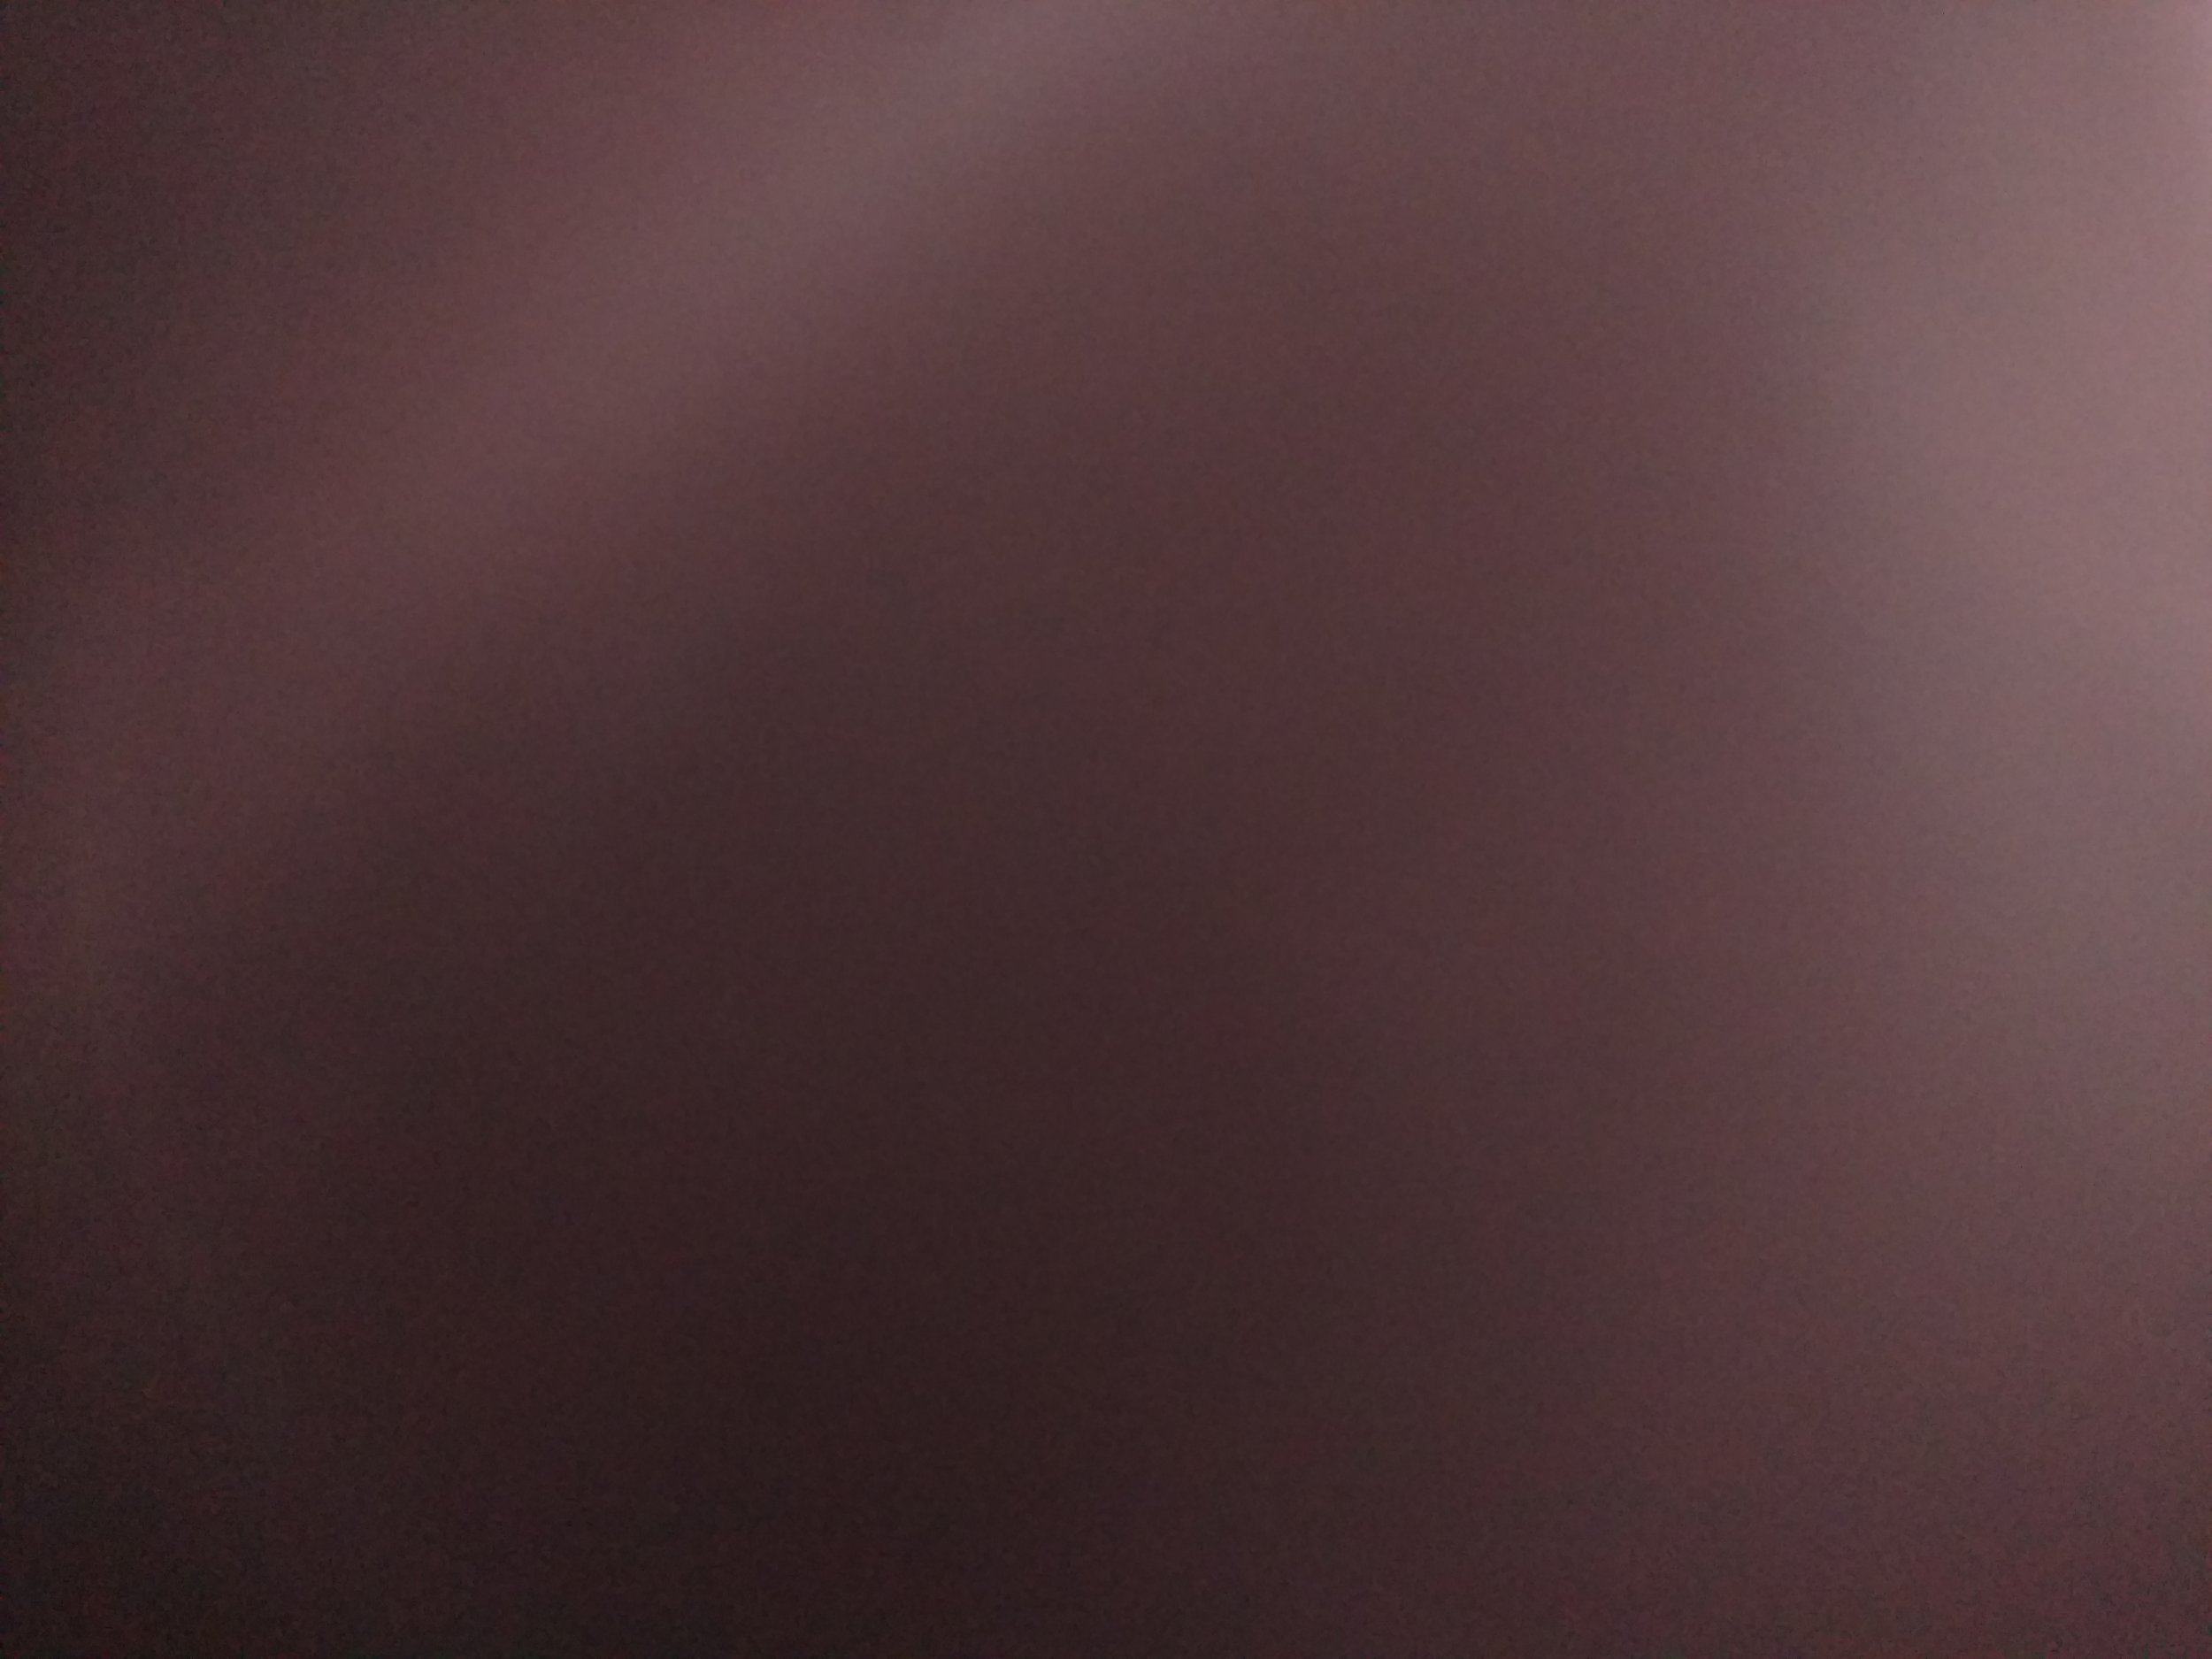 willroth-co-free-texture-gradient-015.jpg